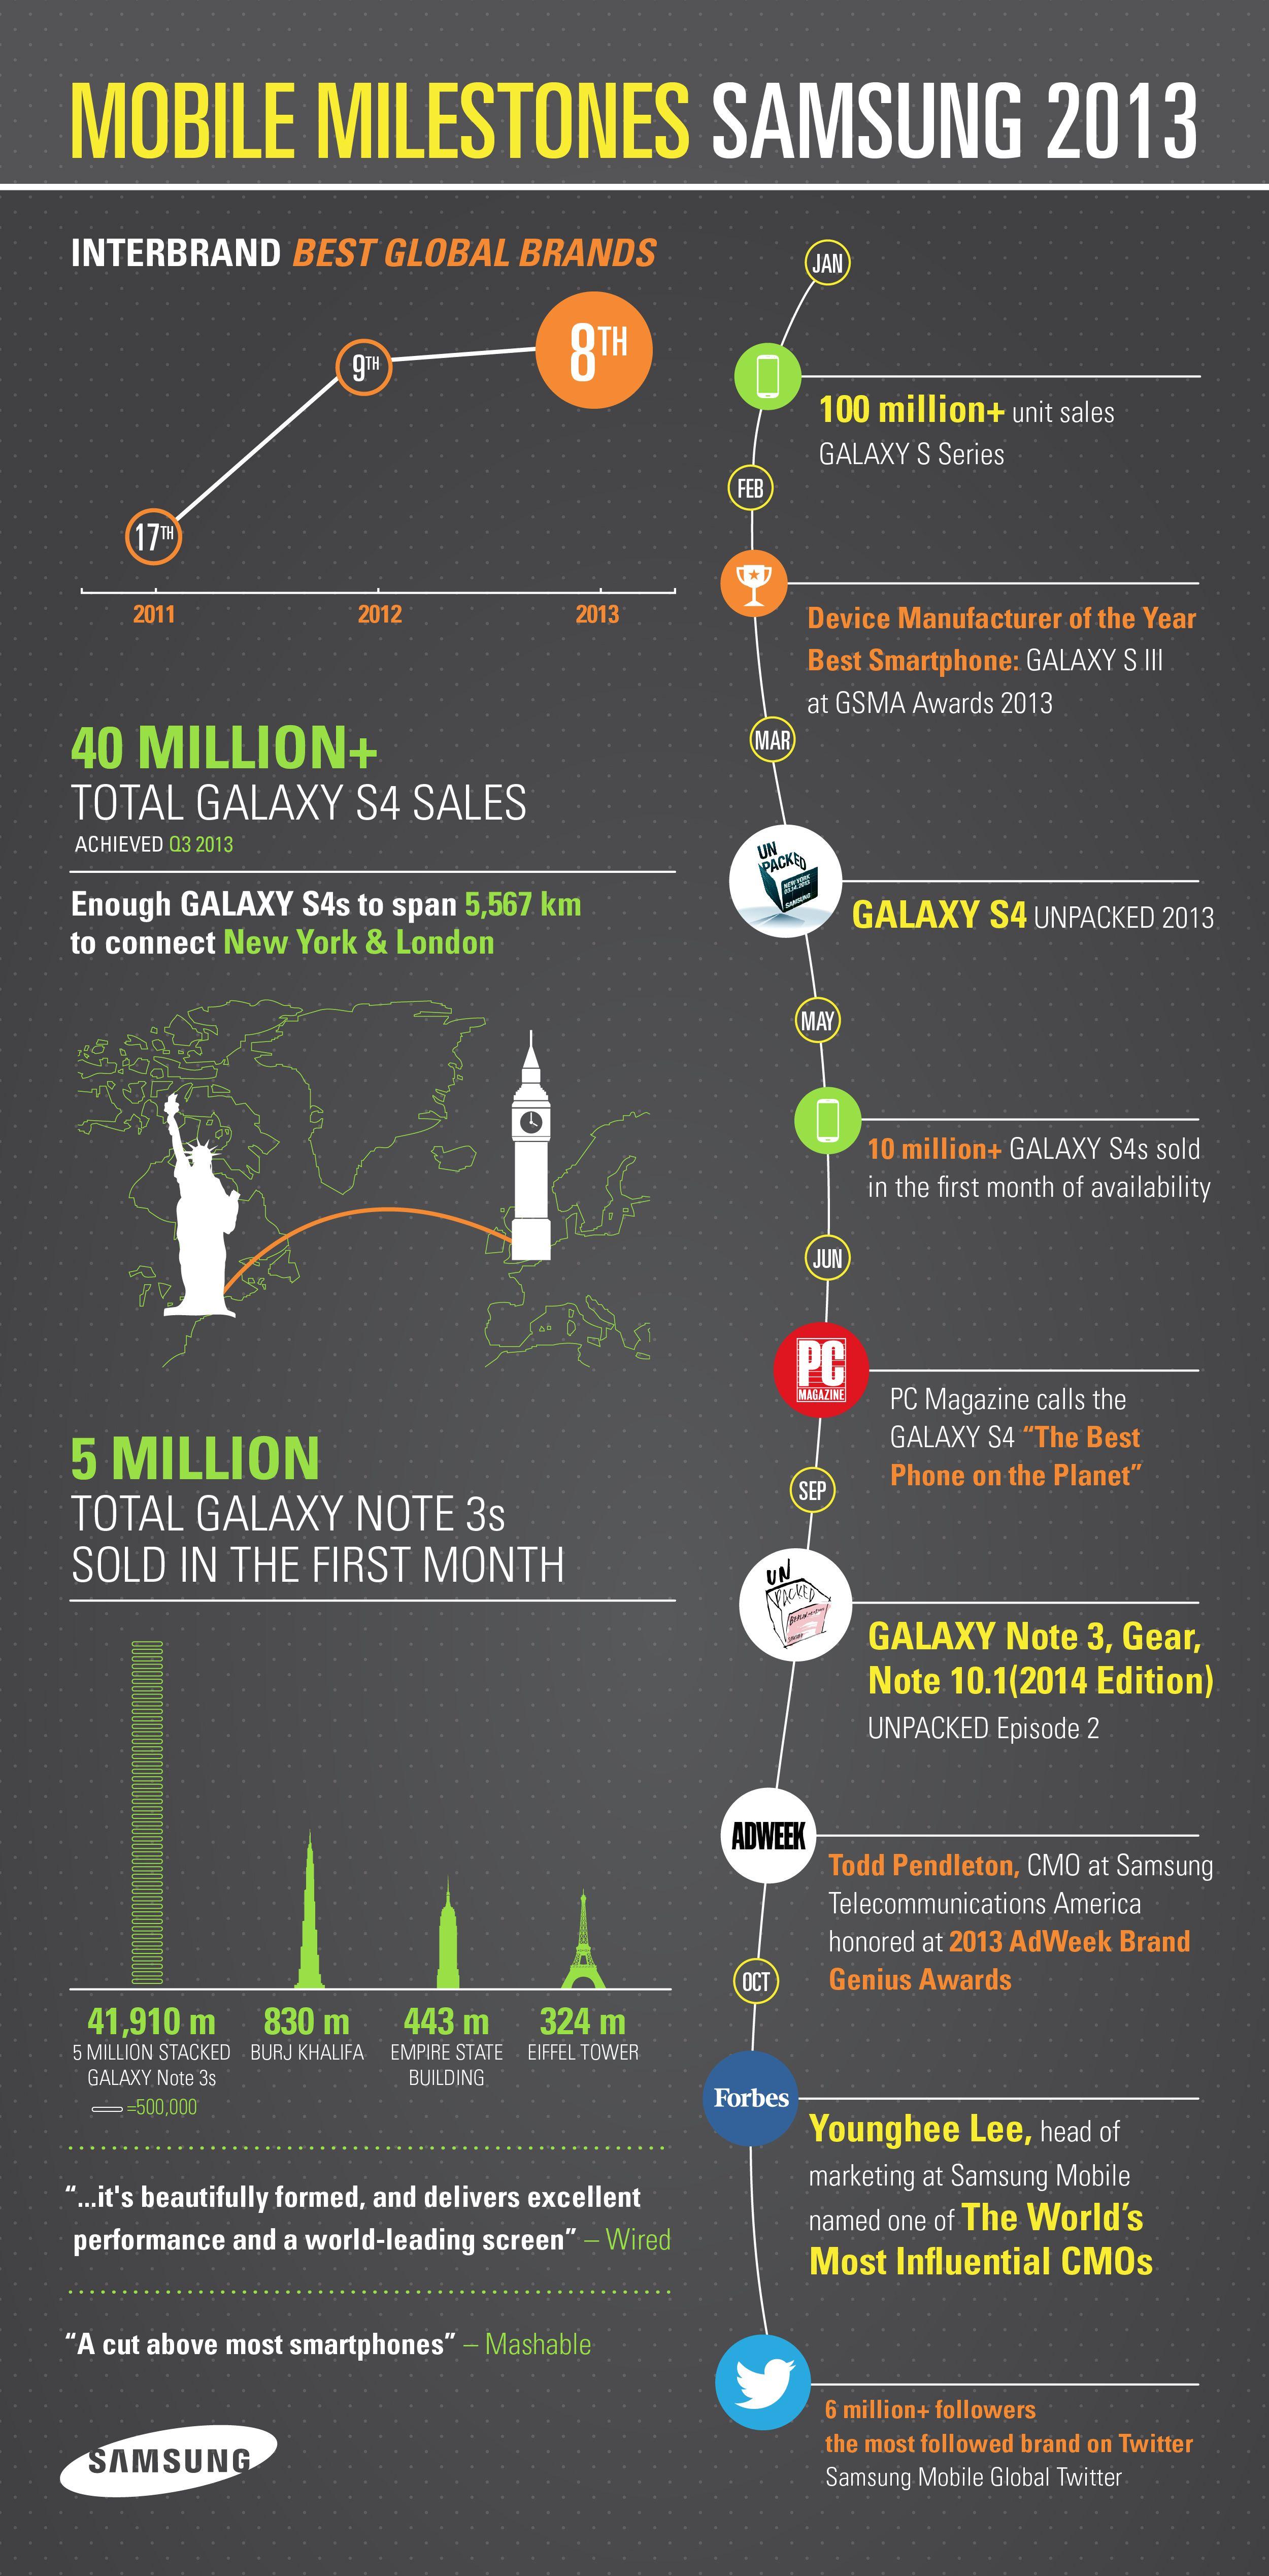 infographic-Mobile-Milestones-Samsung